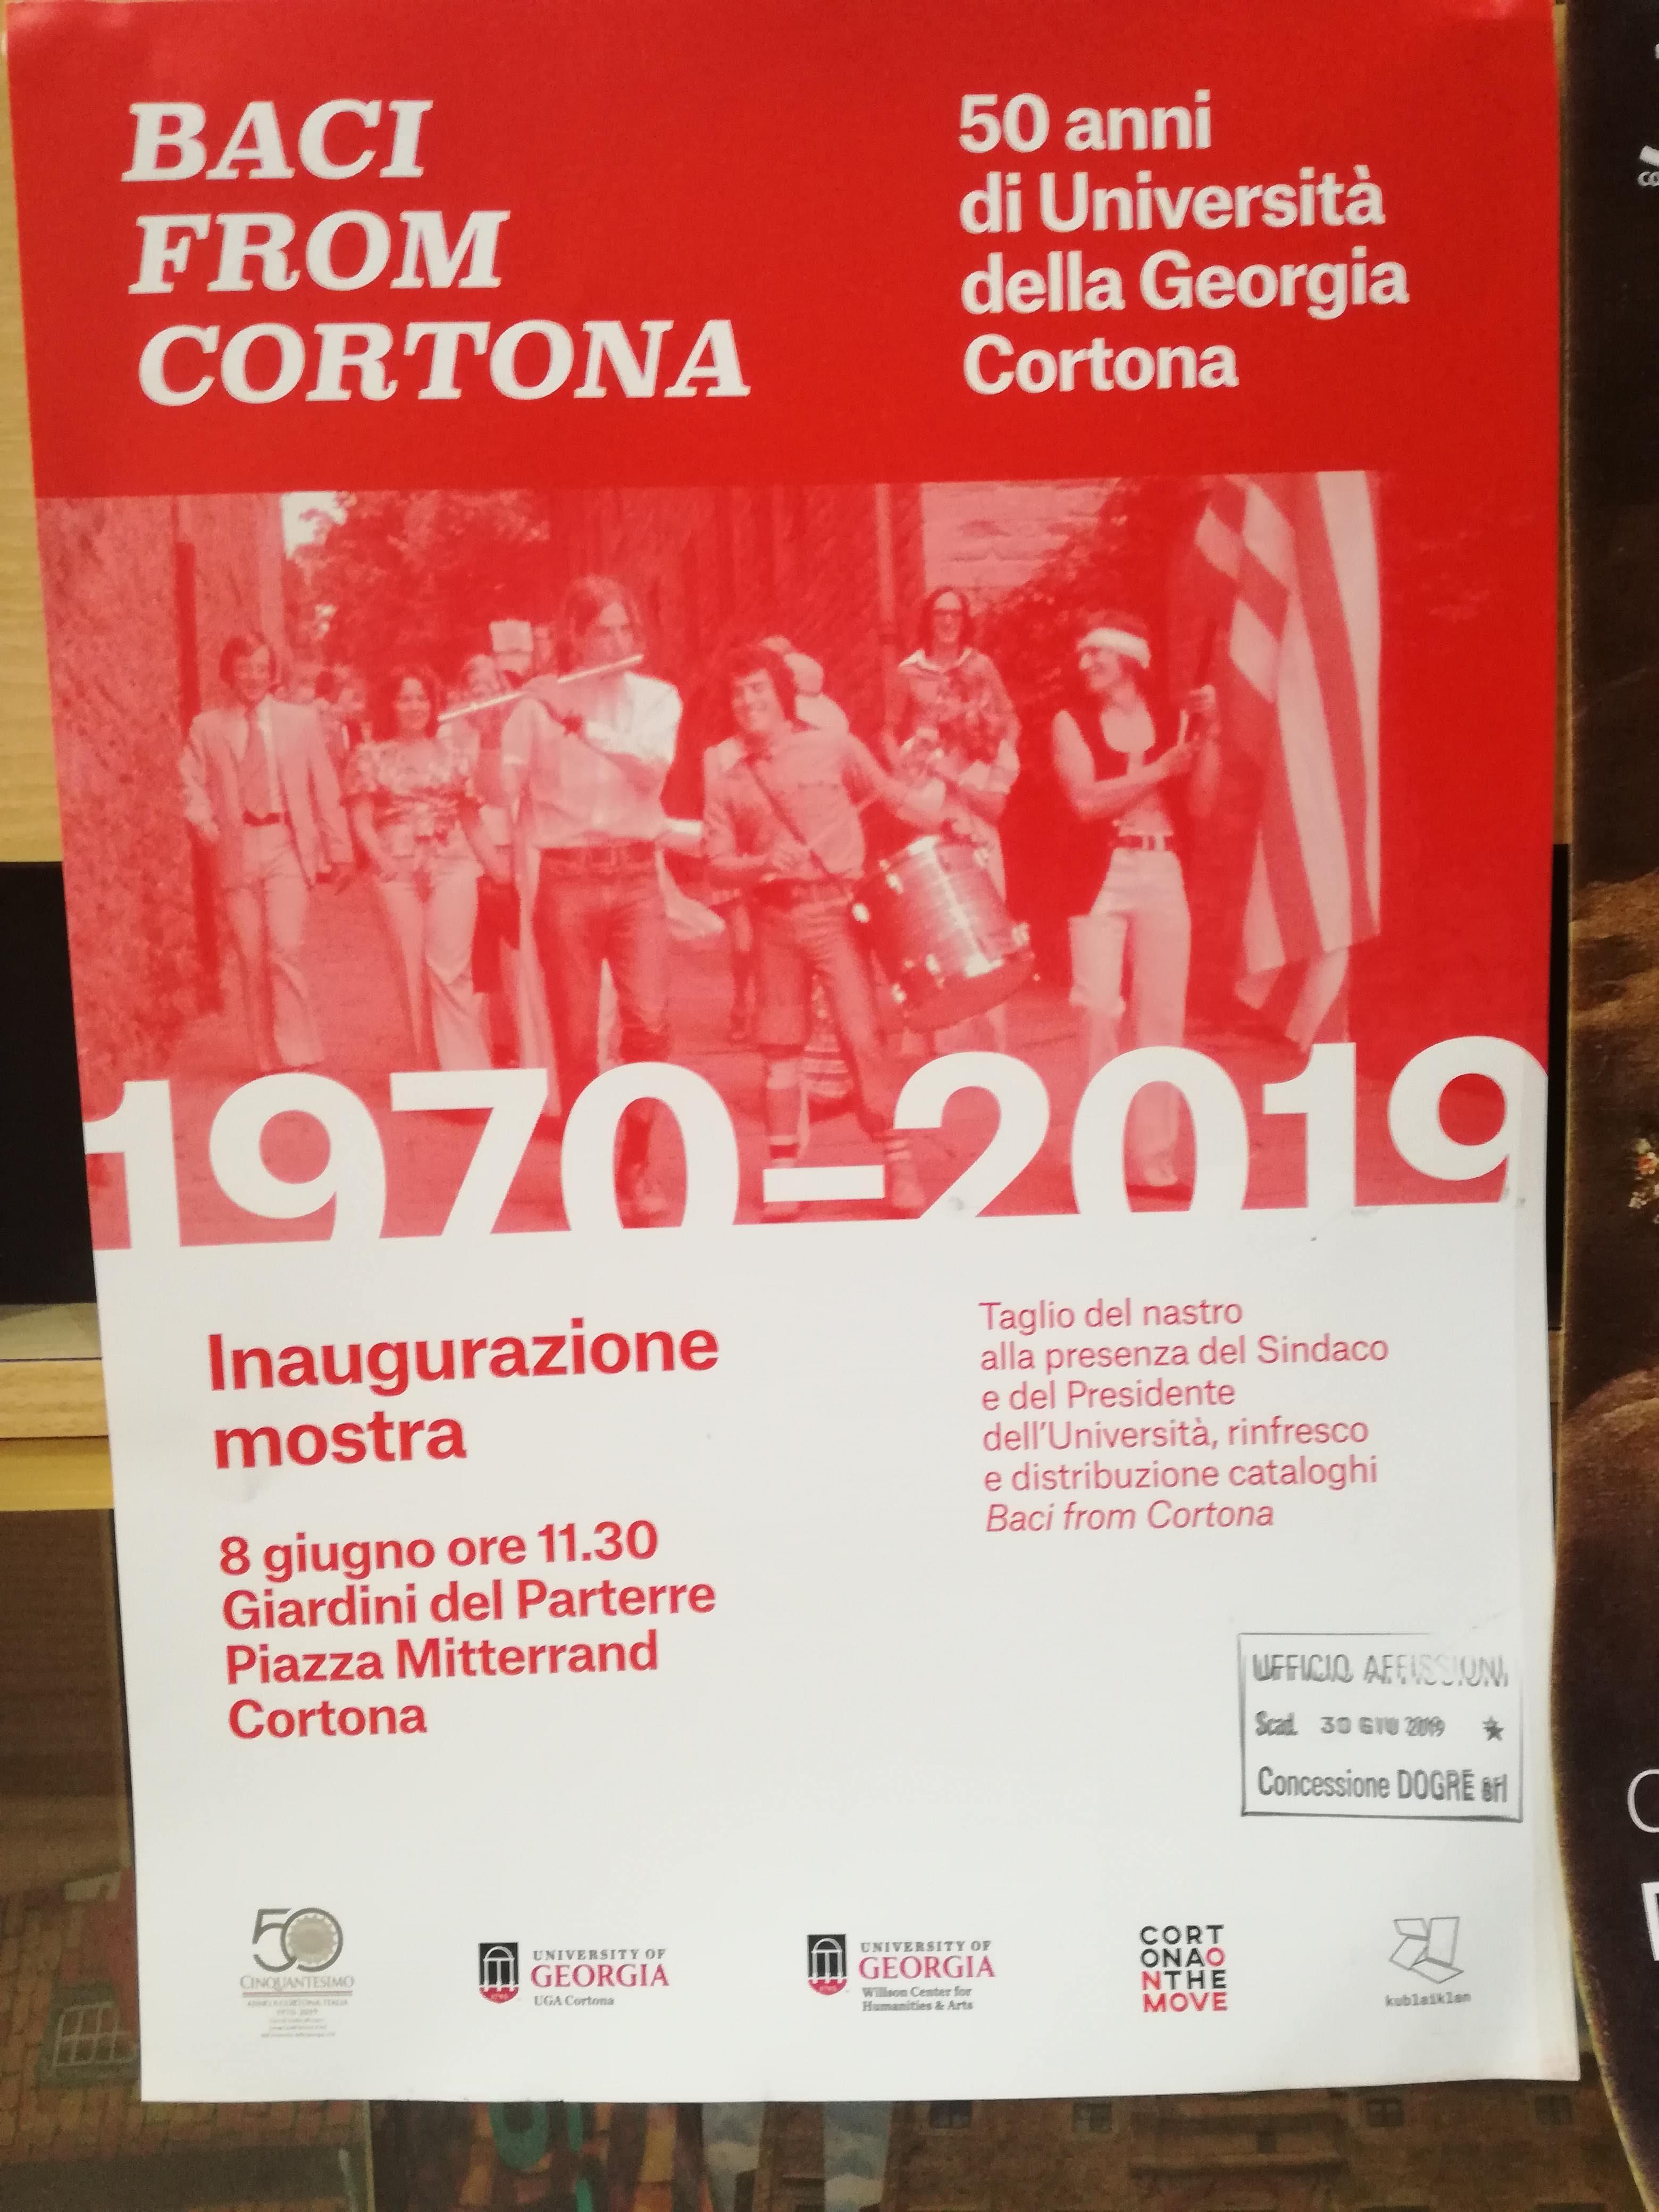 UGA cortona 50th anniversary